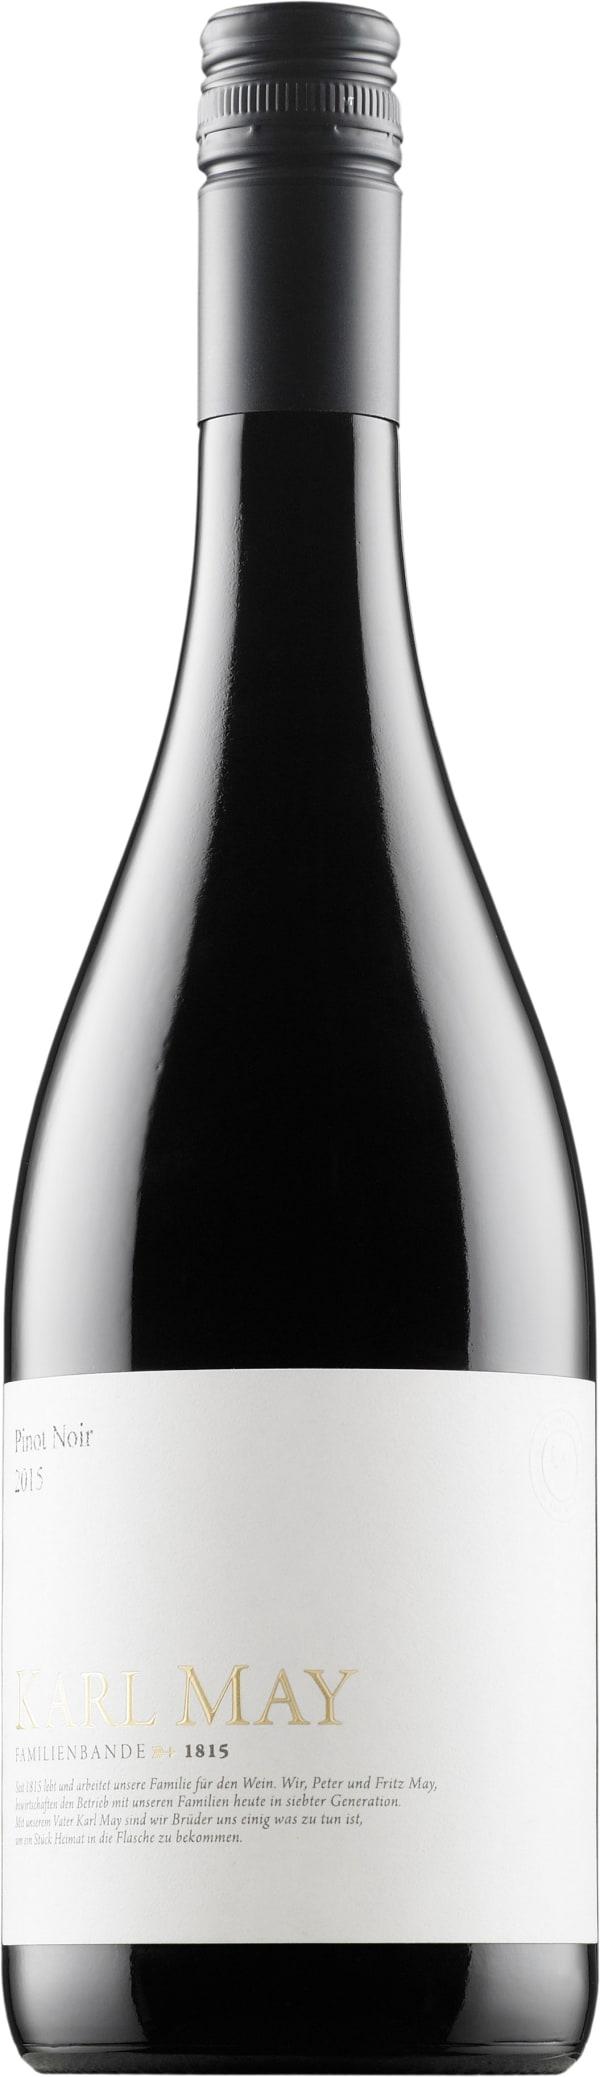 Karl May Pinot Noir 2019